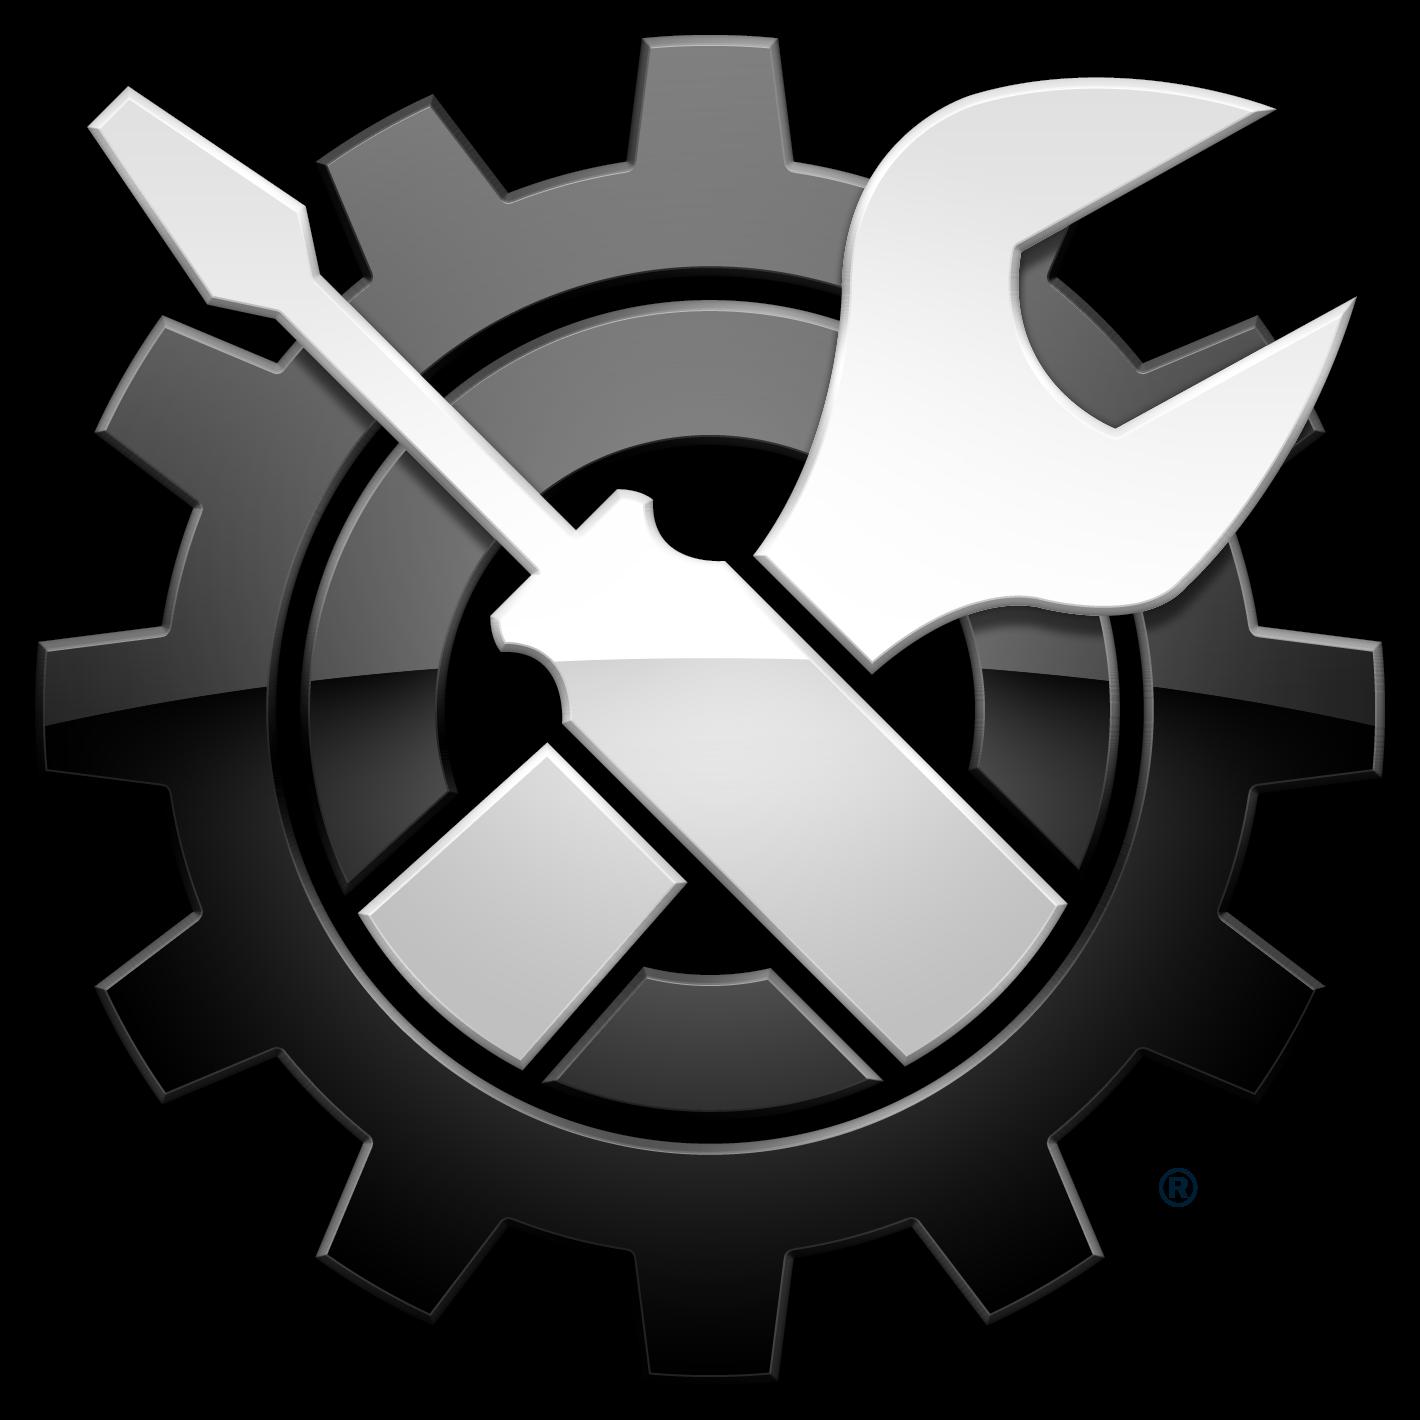 [Software] System Mechanic 14.5: Boosts Internet ...